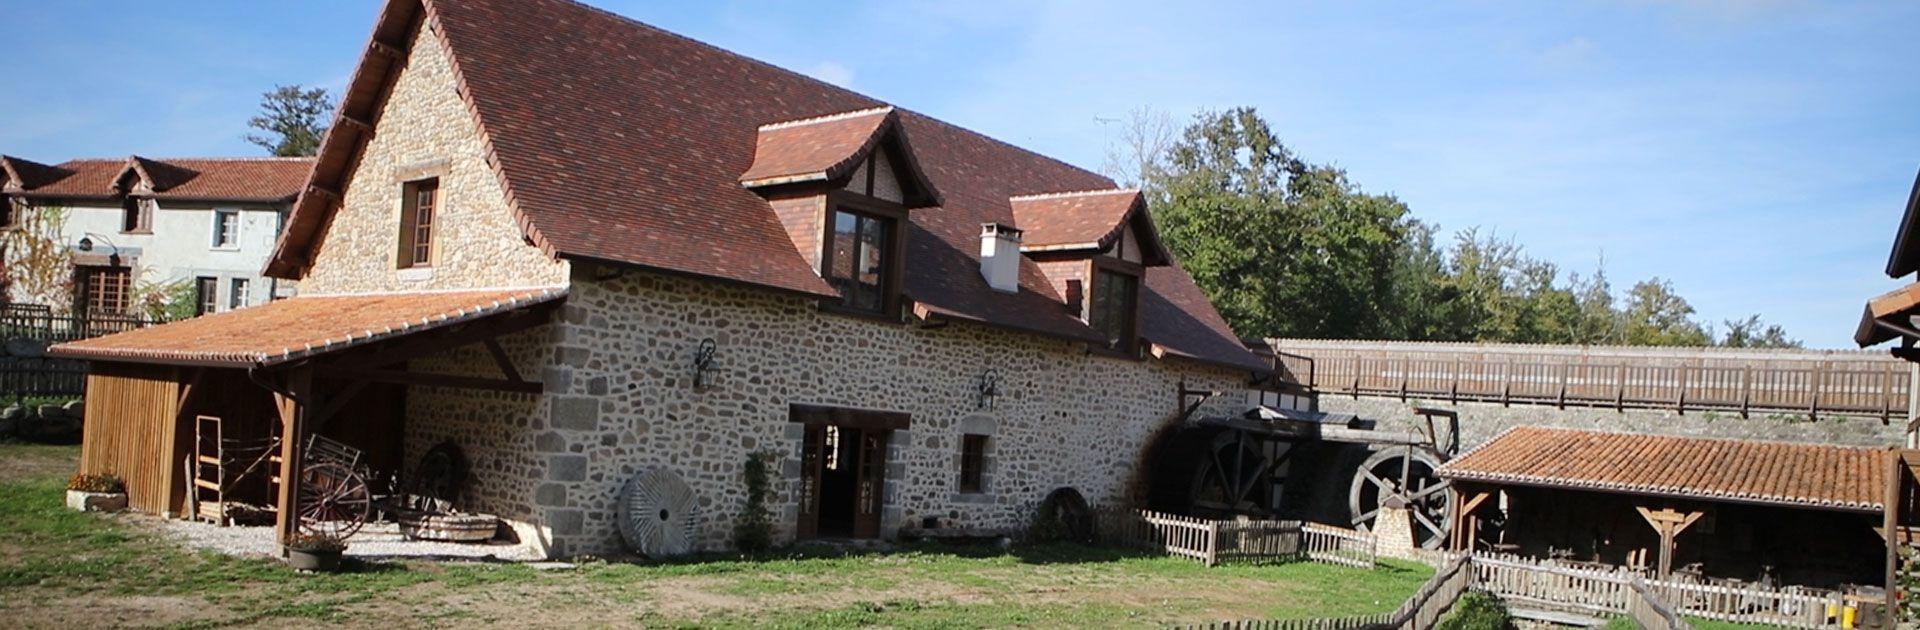 Couteau de Nontron Périgord vieux métiers artisan Moulin